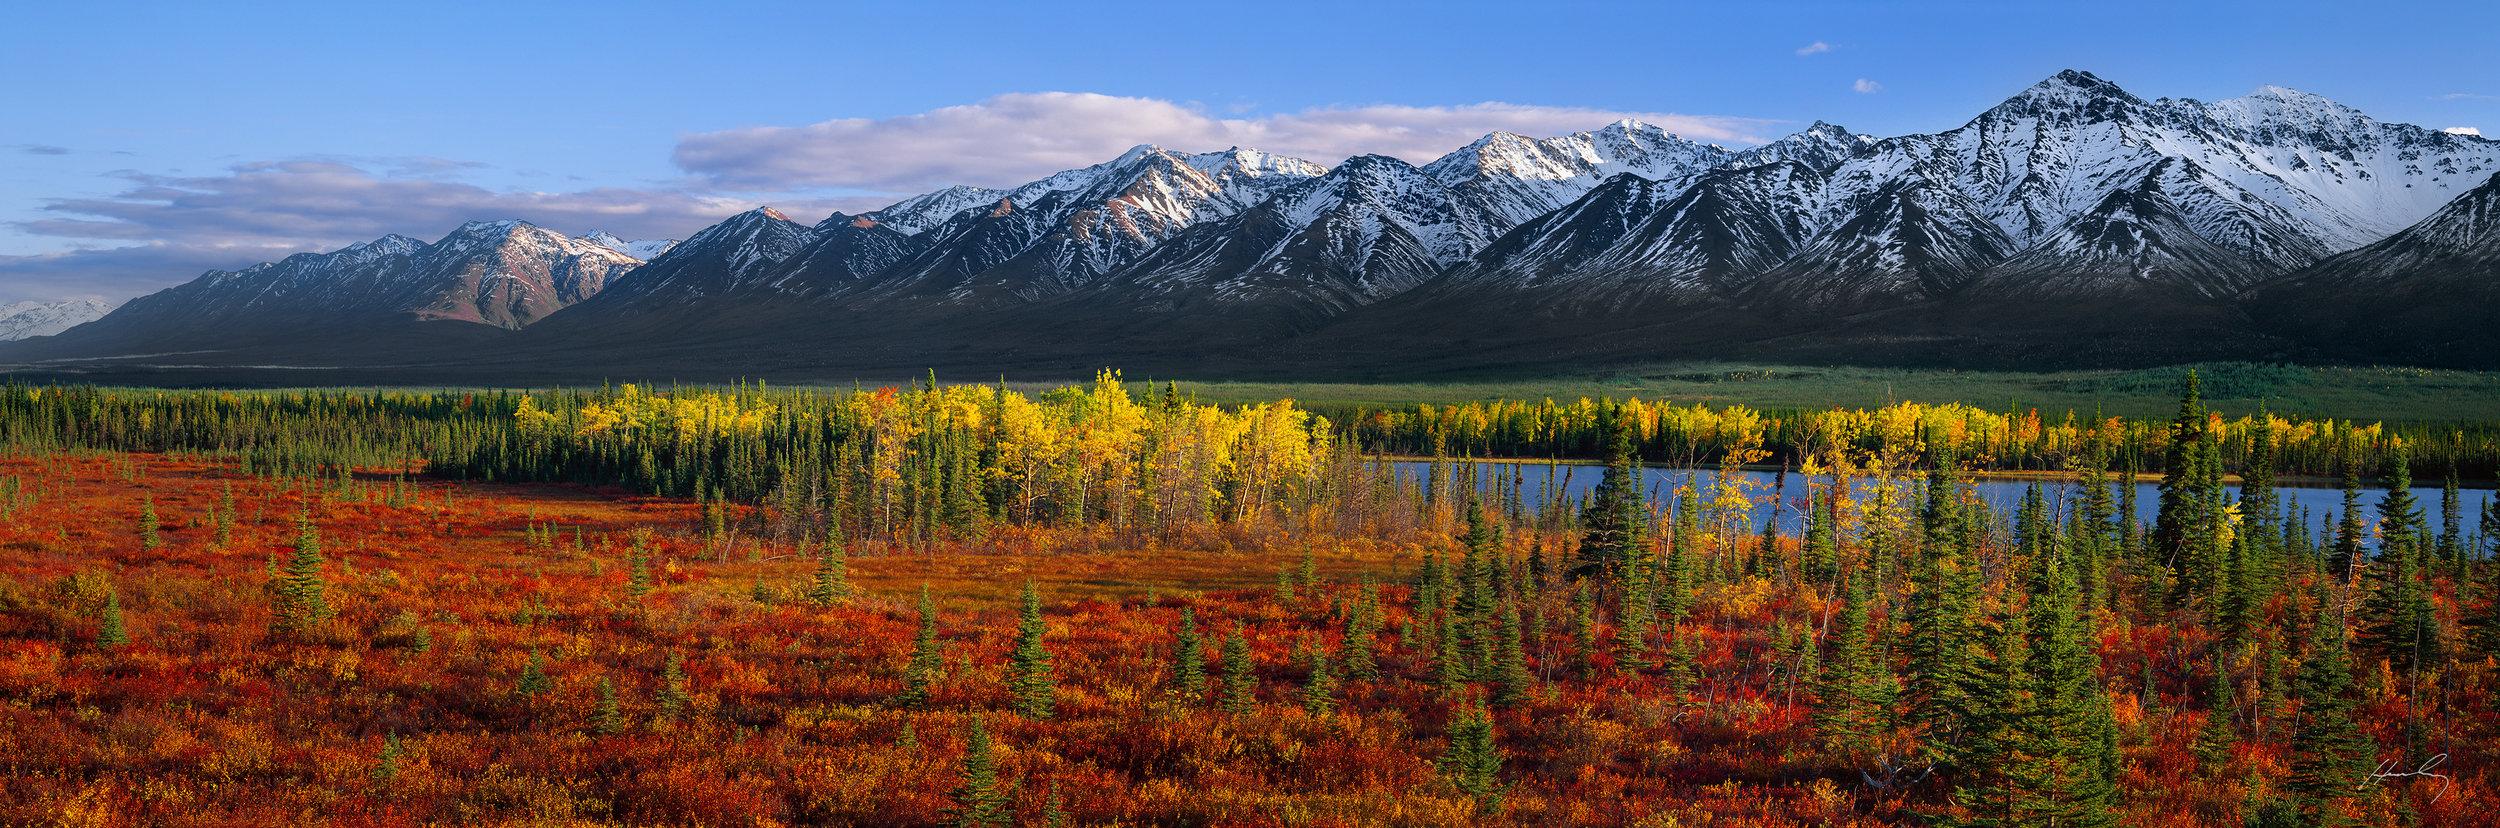 """Fall Paintbrush"" Kluane Mountains, Yukon, Canada"